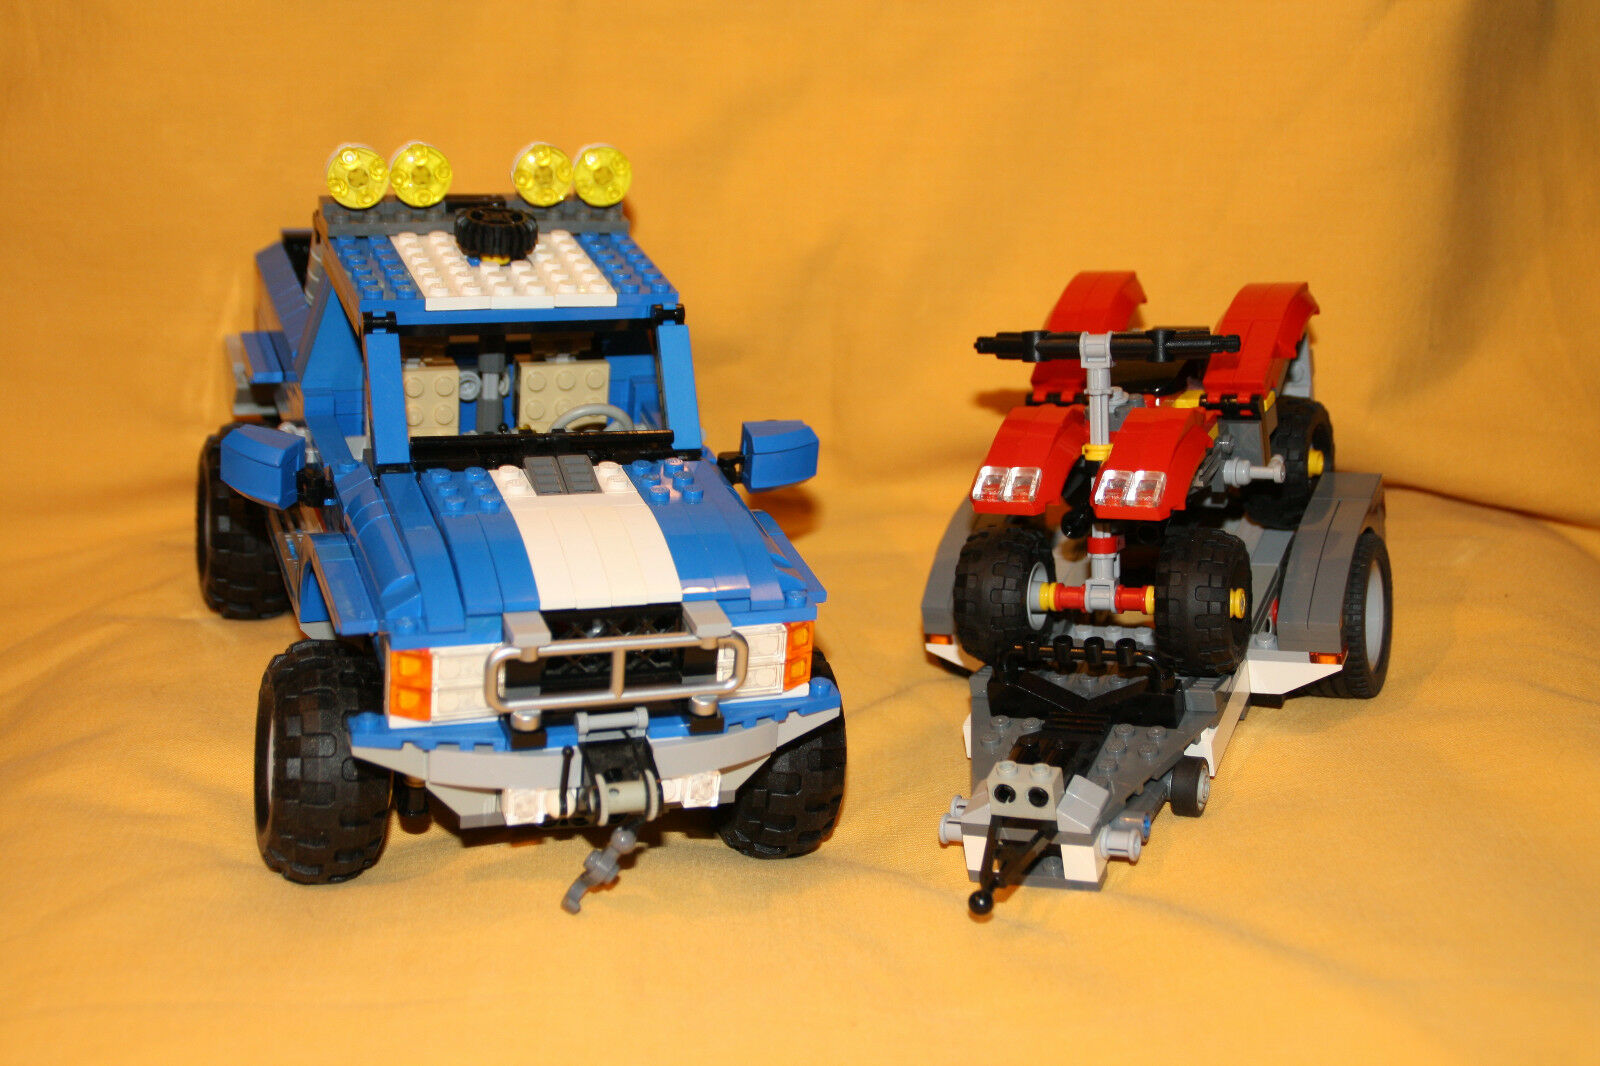 Lego creator sammlung konvolut auflösung offroad power 5893